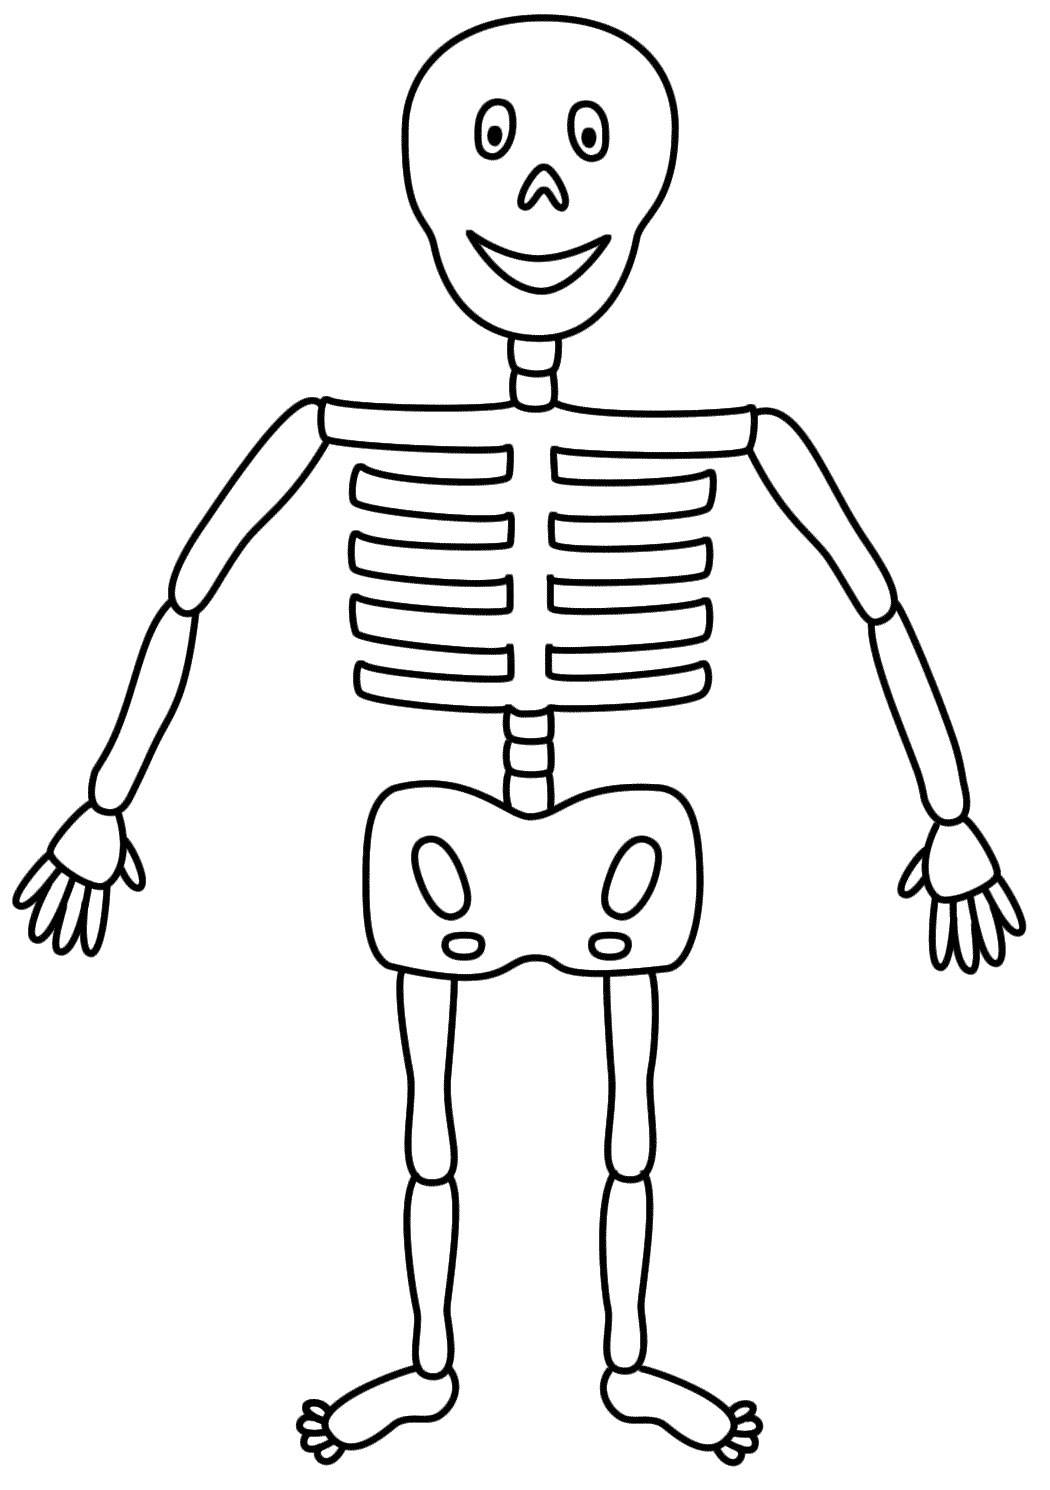 Simple Skeleton Coloring Page